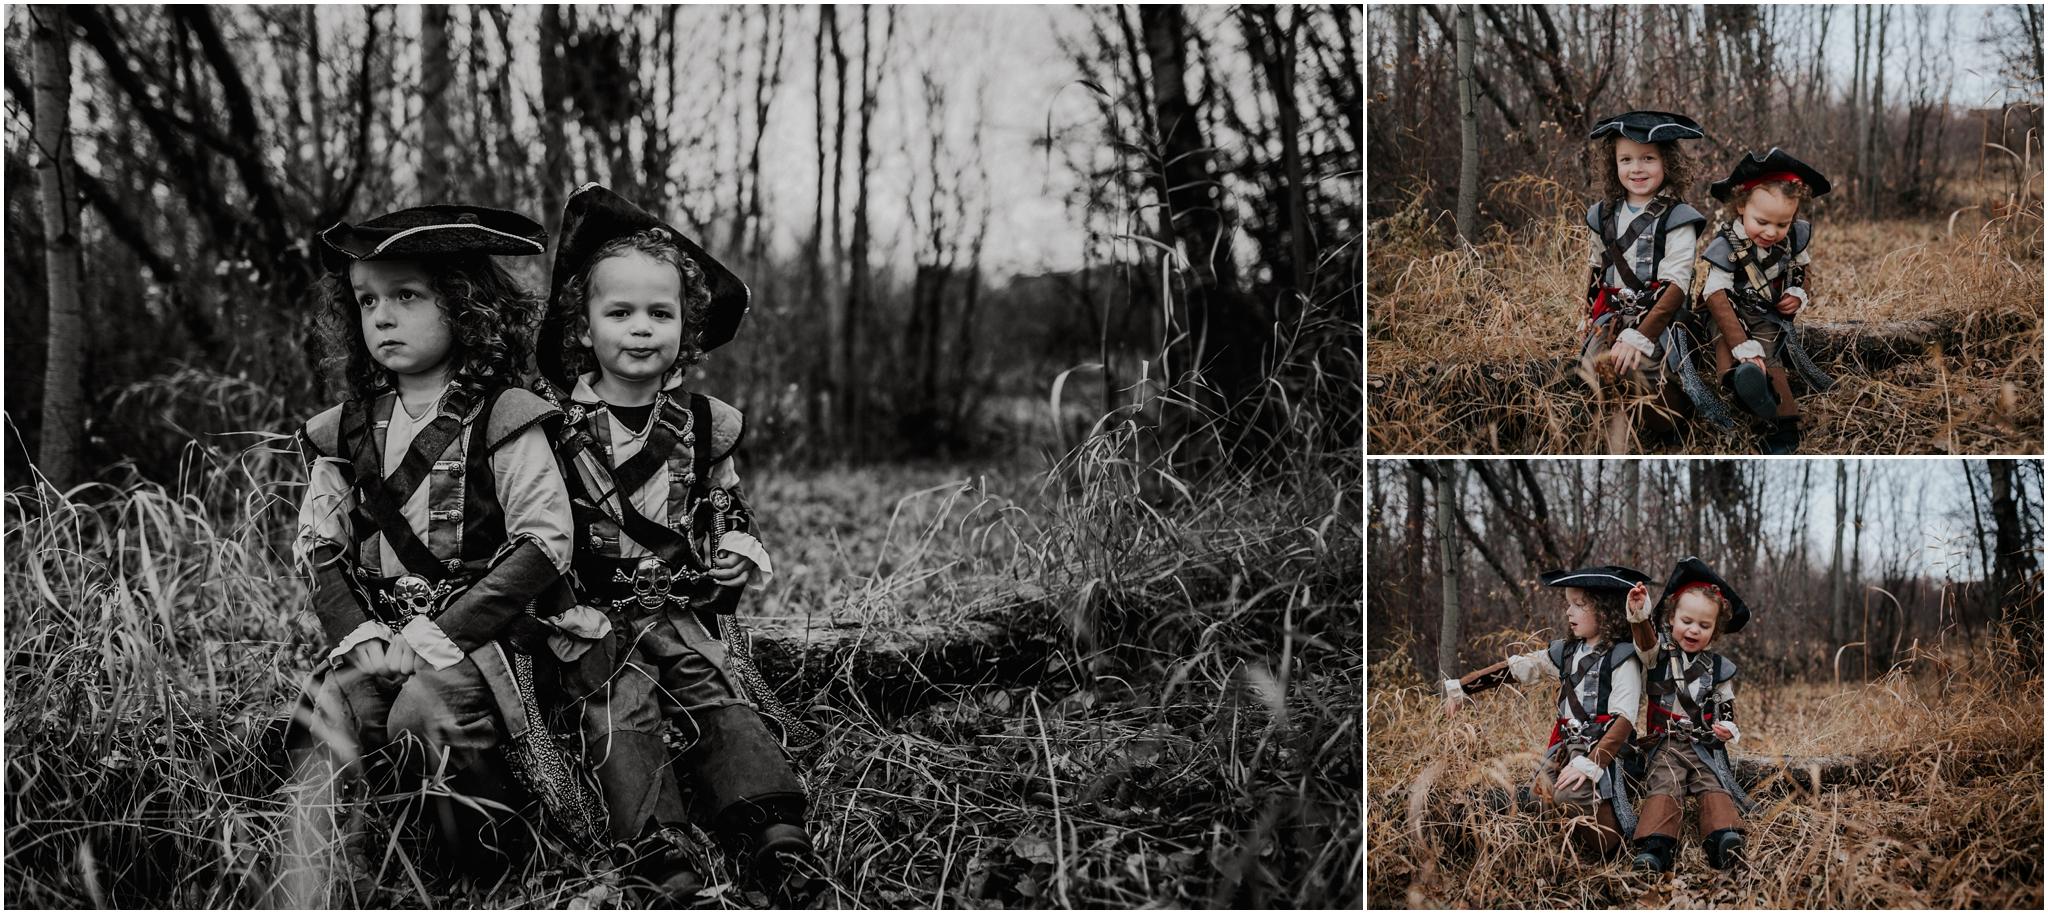 Edmonton Family Children Photographer - Halloween Pirate Costume